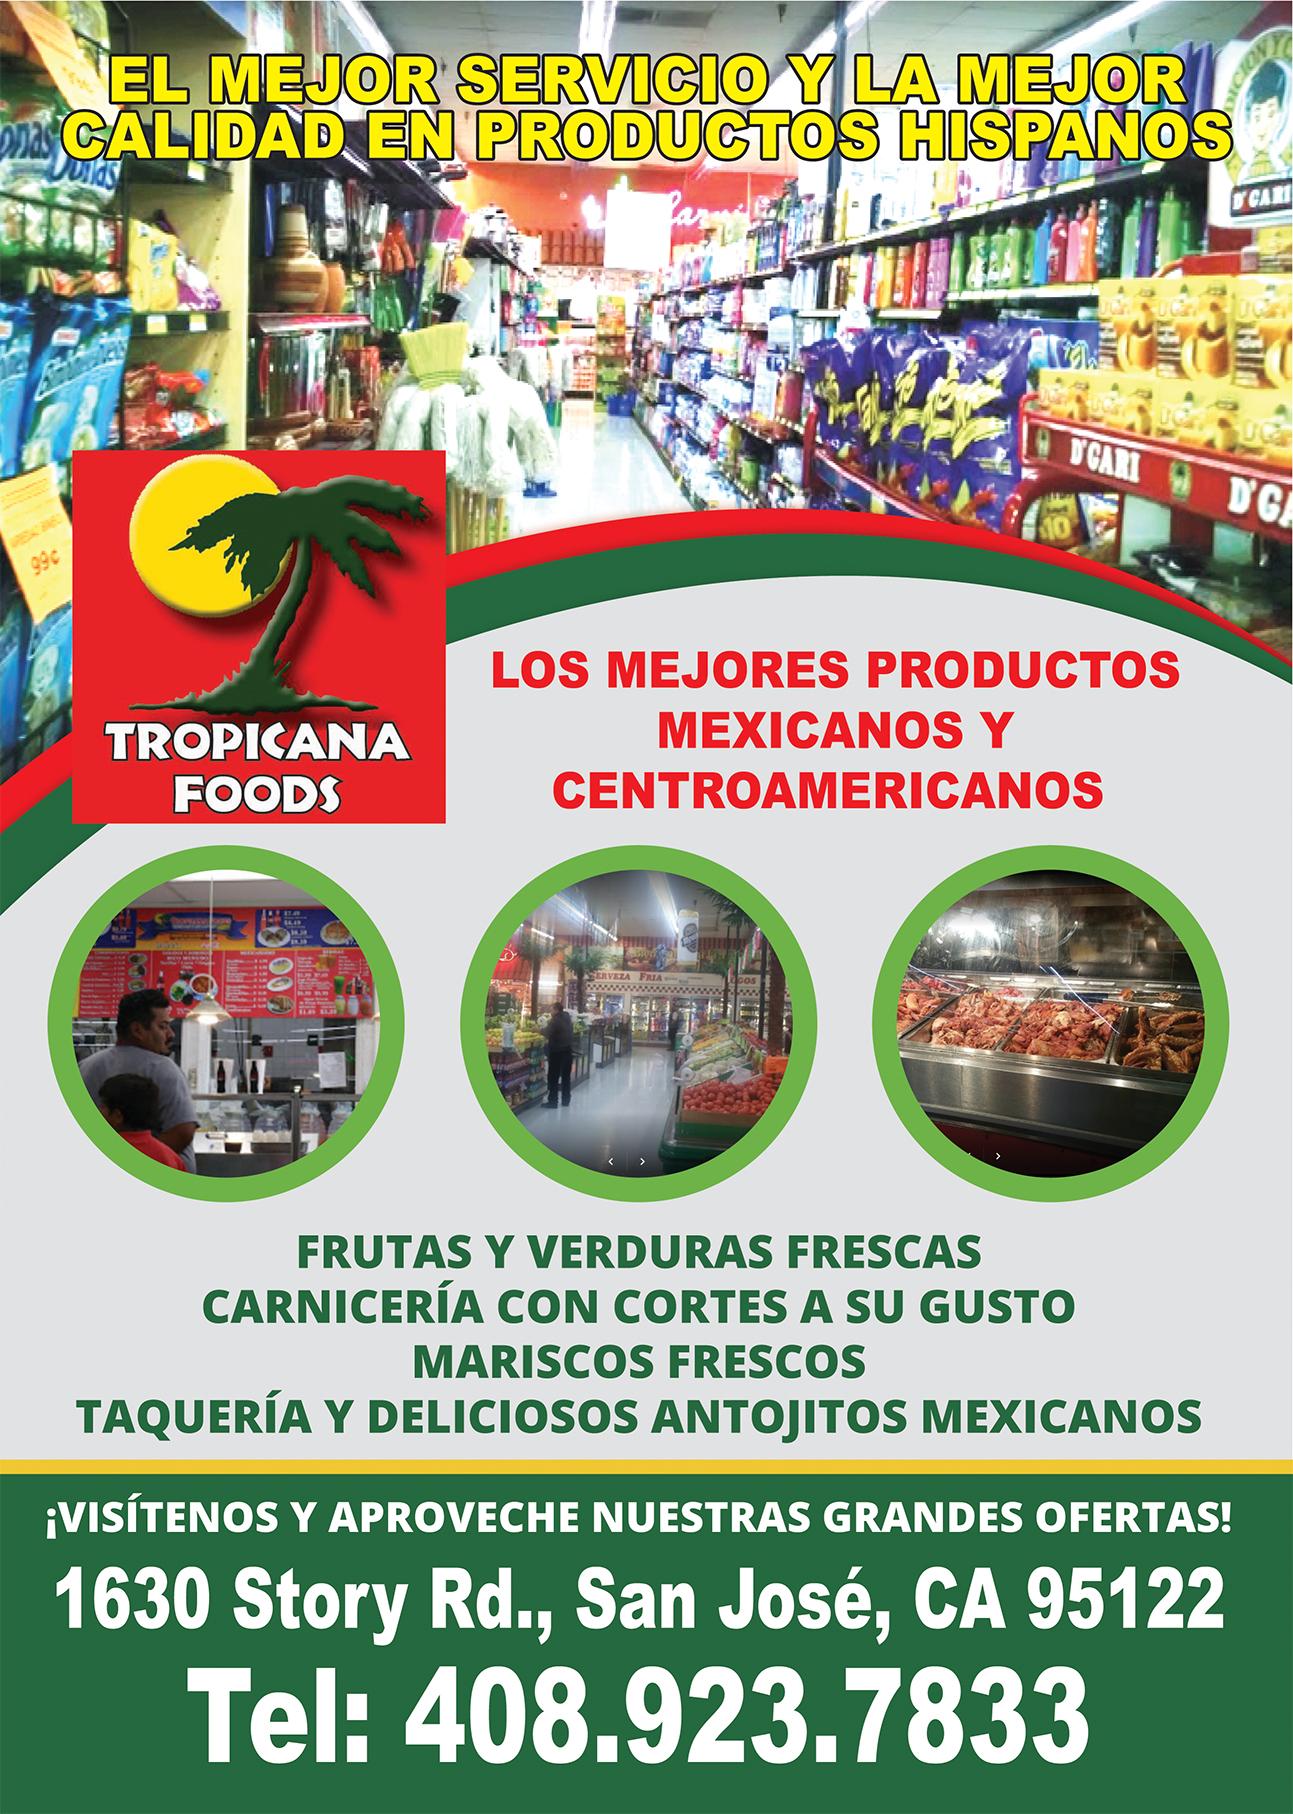 Tropicana Foods - San Jose 1-4 Pag Agosto 2018_1 copy.jpg